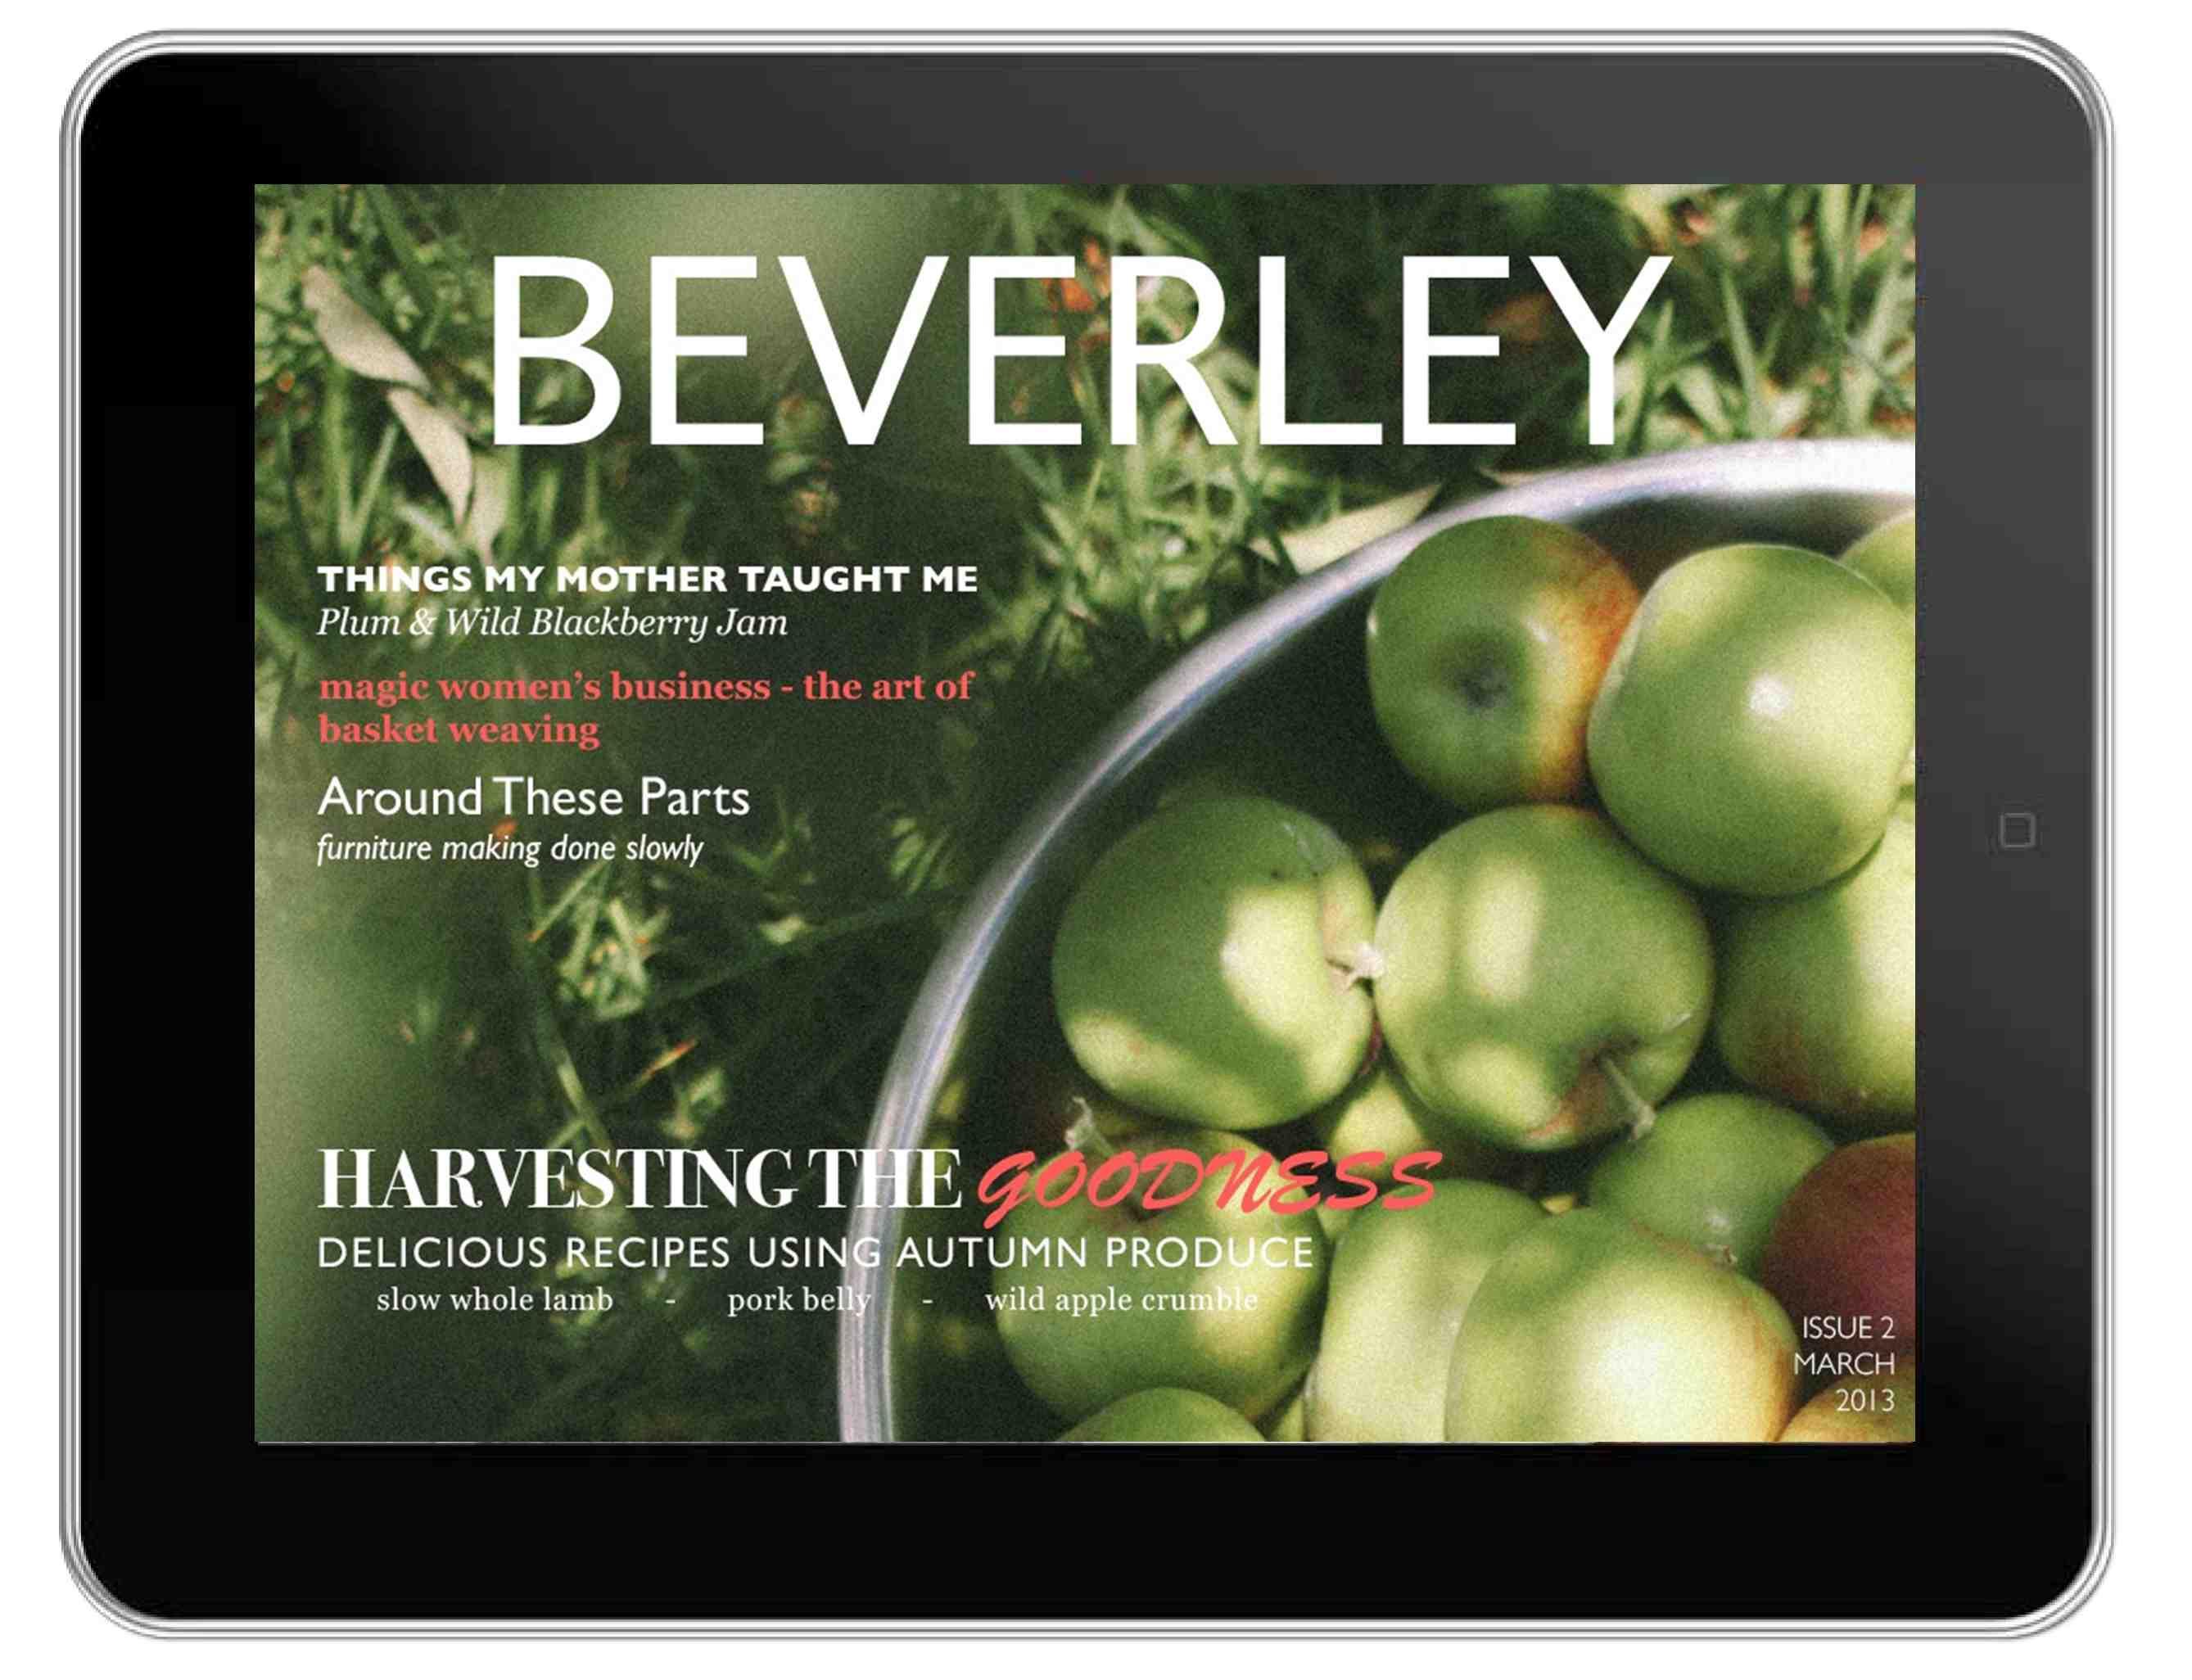 beverley press imagescov_2